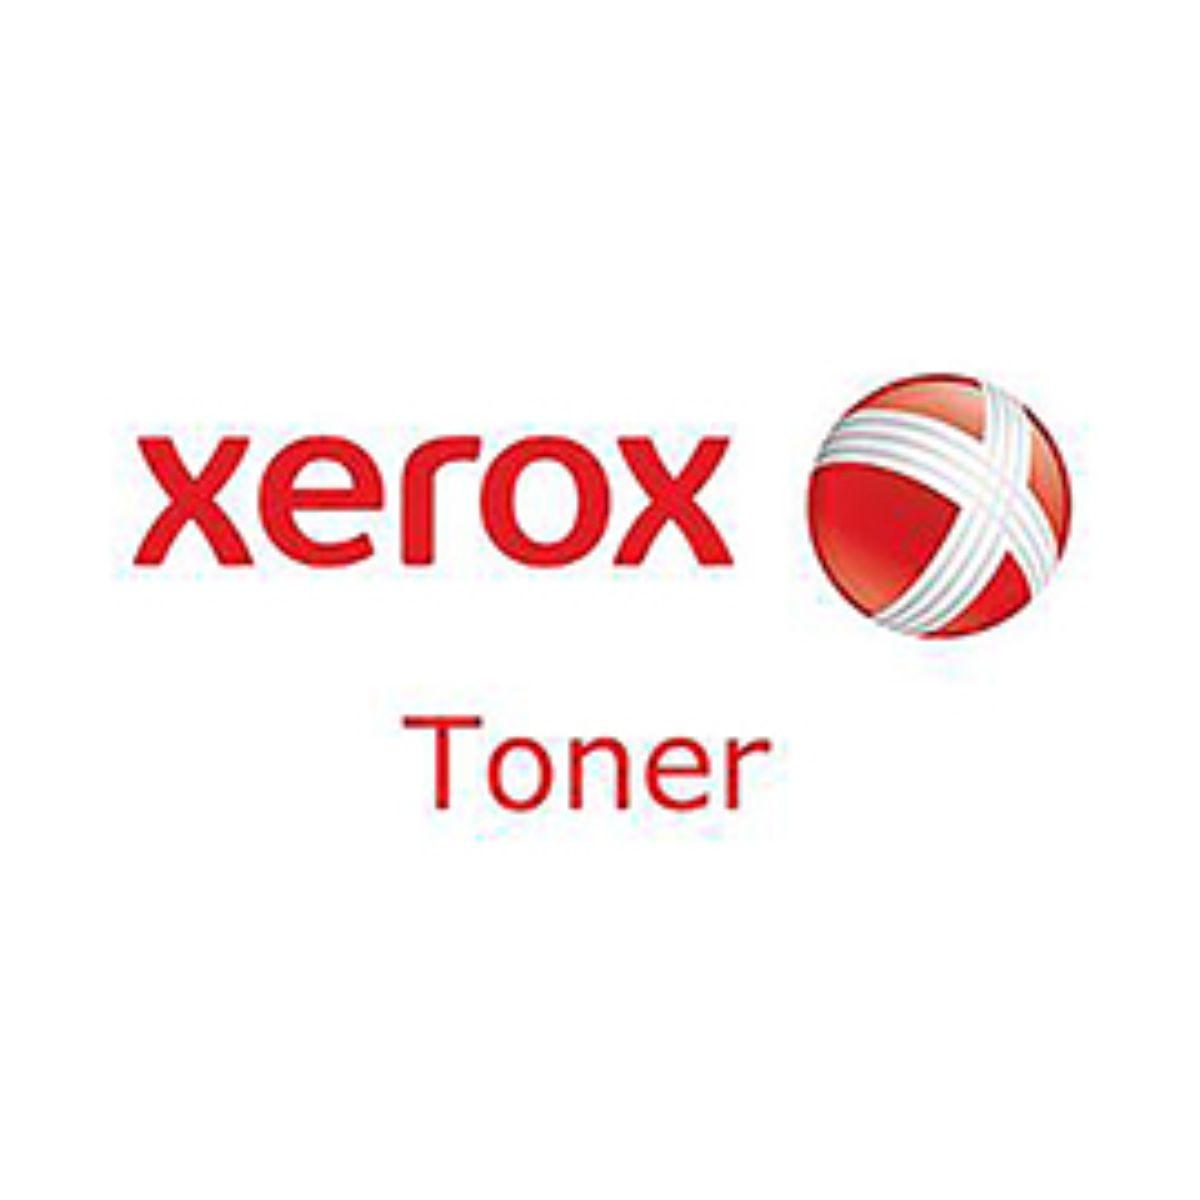 Image of Xerox Phaser 6020, Cyan